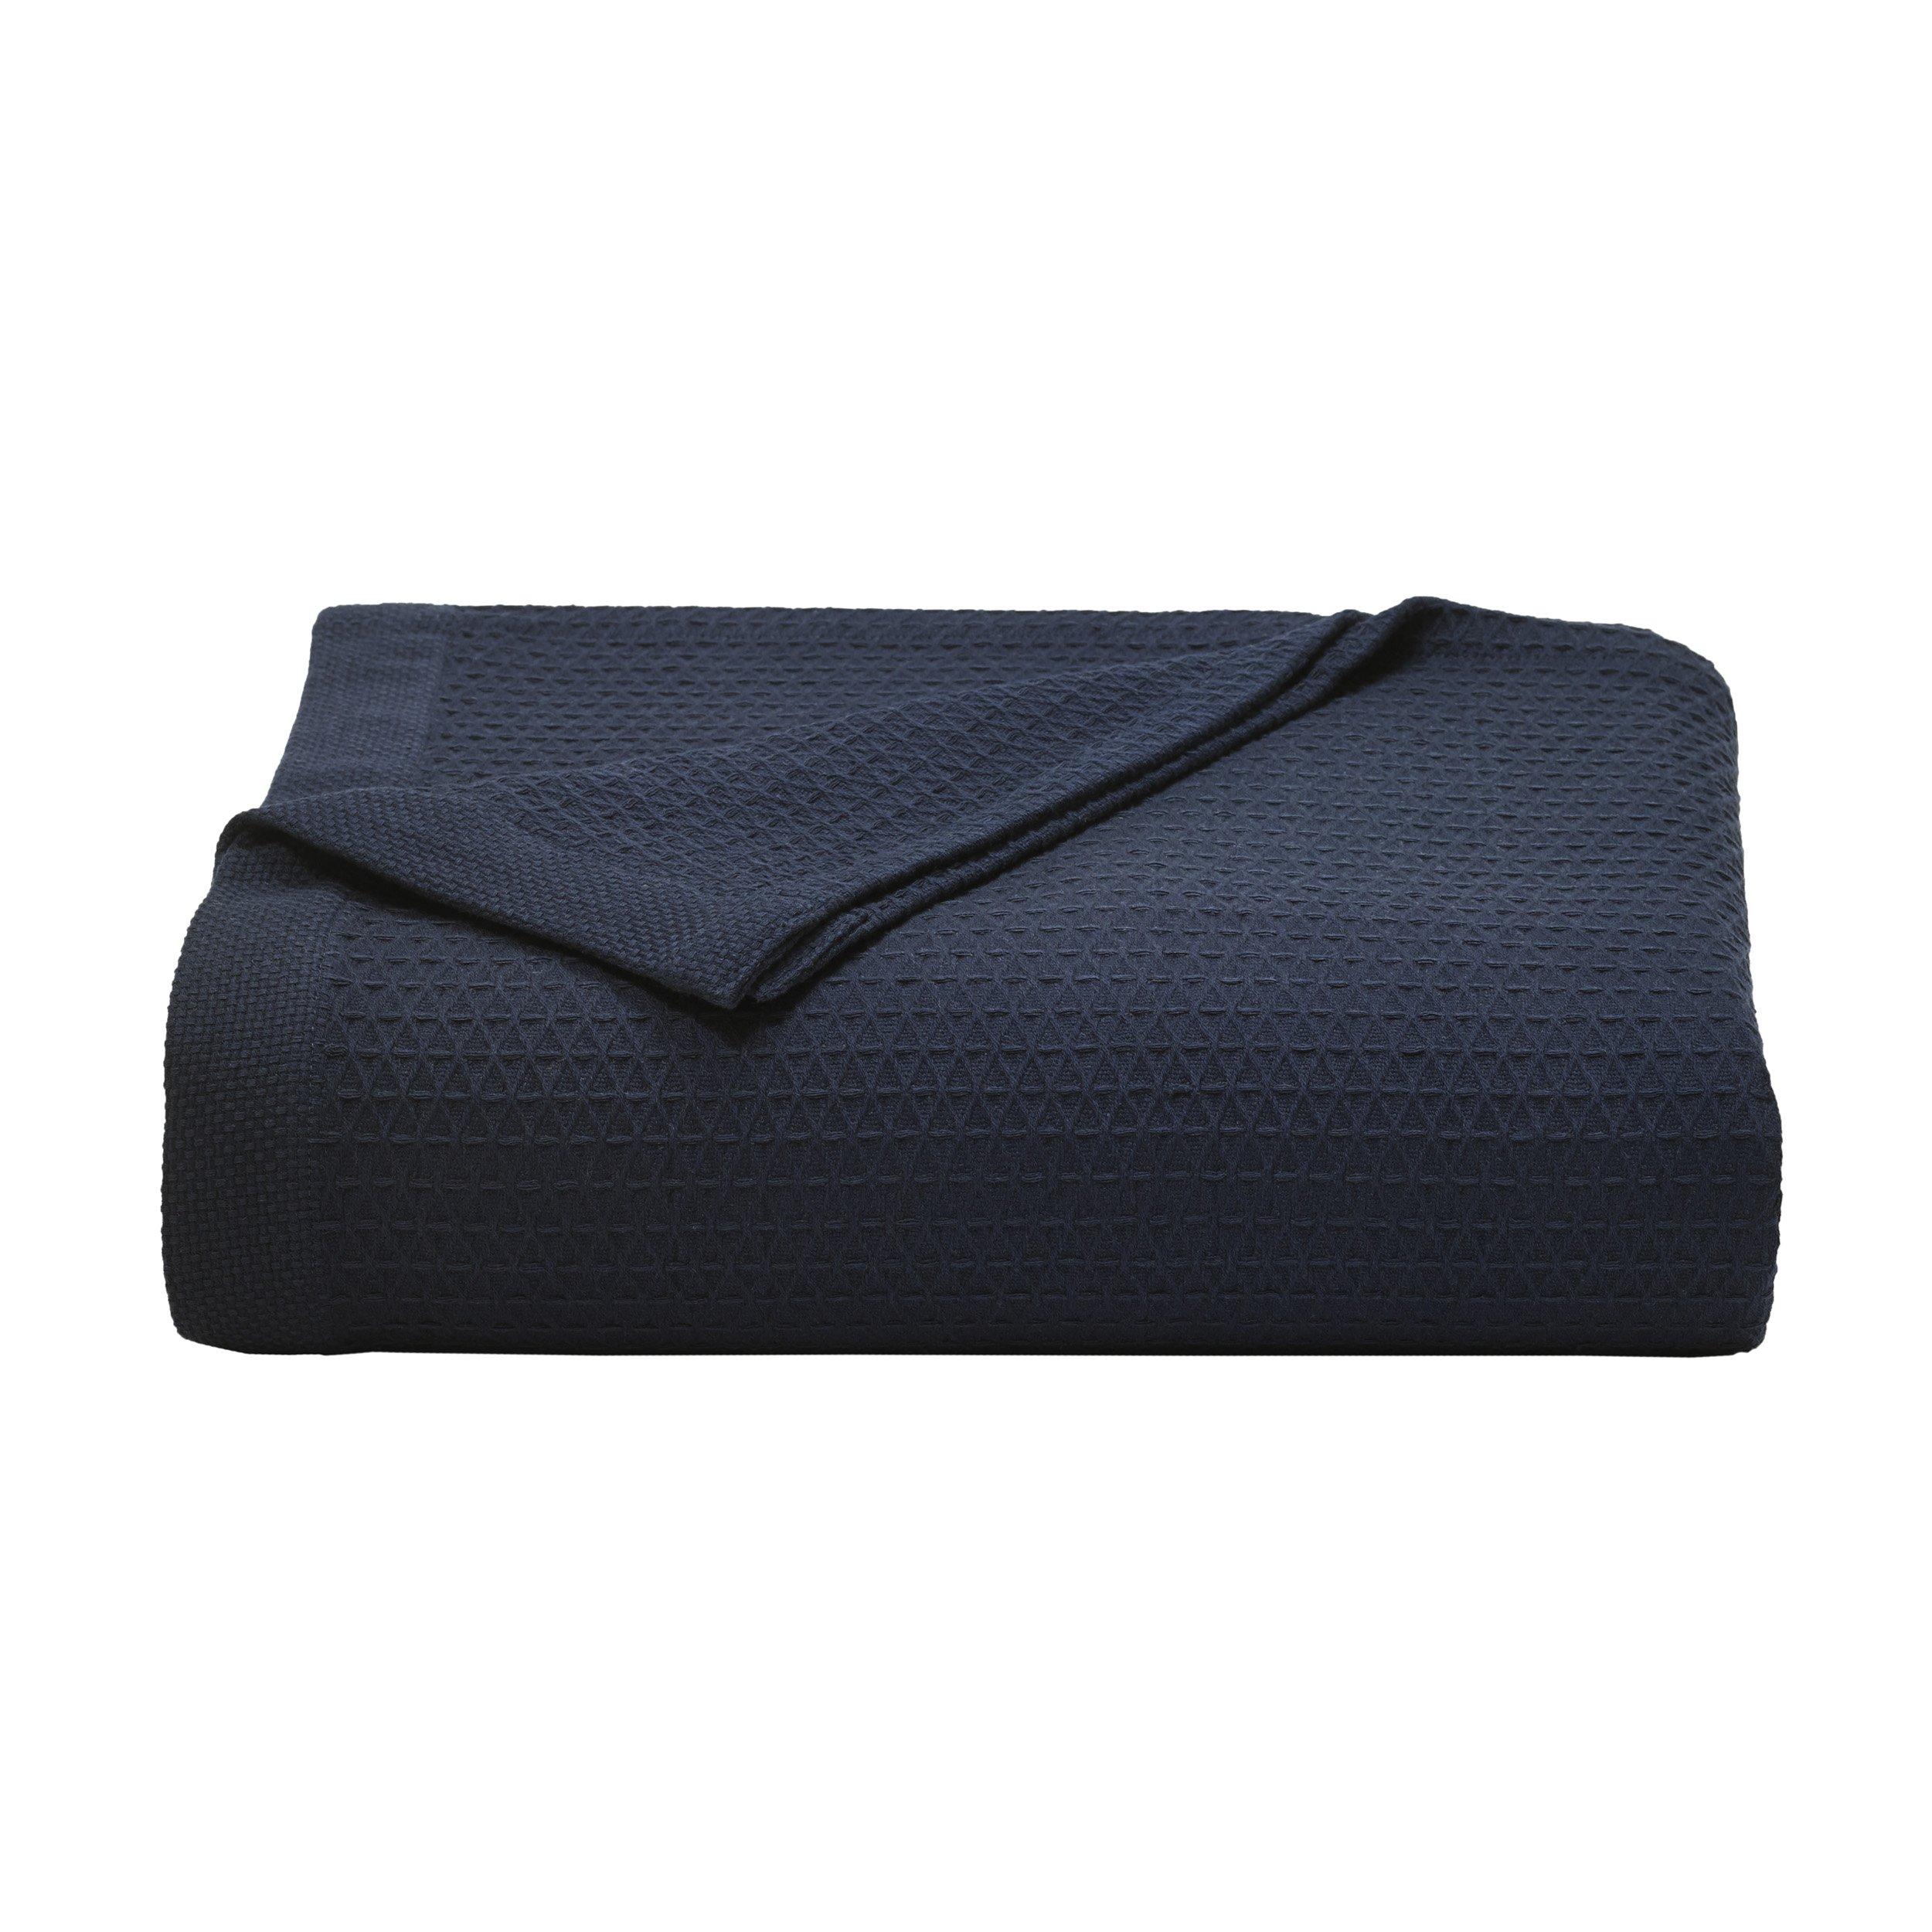 Nautica 216080 Baird Navy Cotton Blanket, Twin,Navy